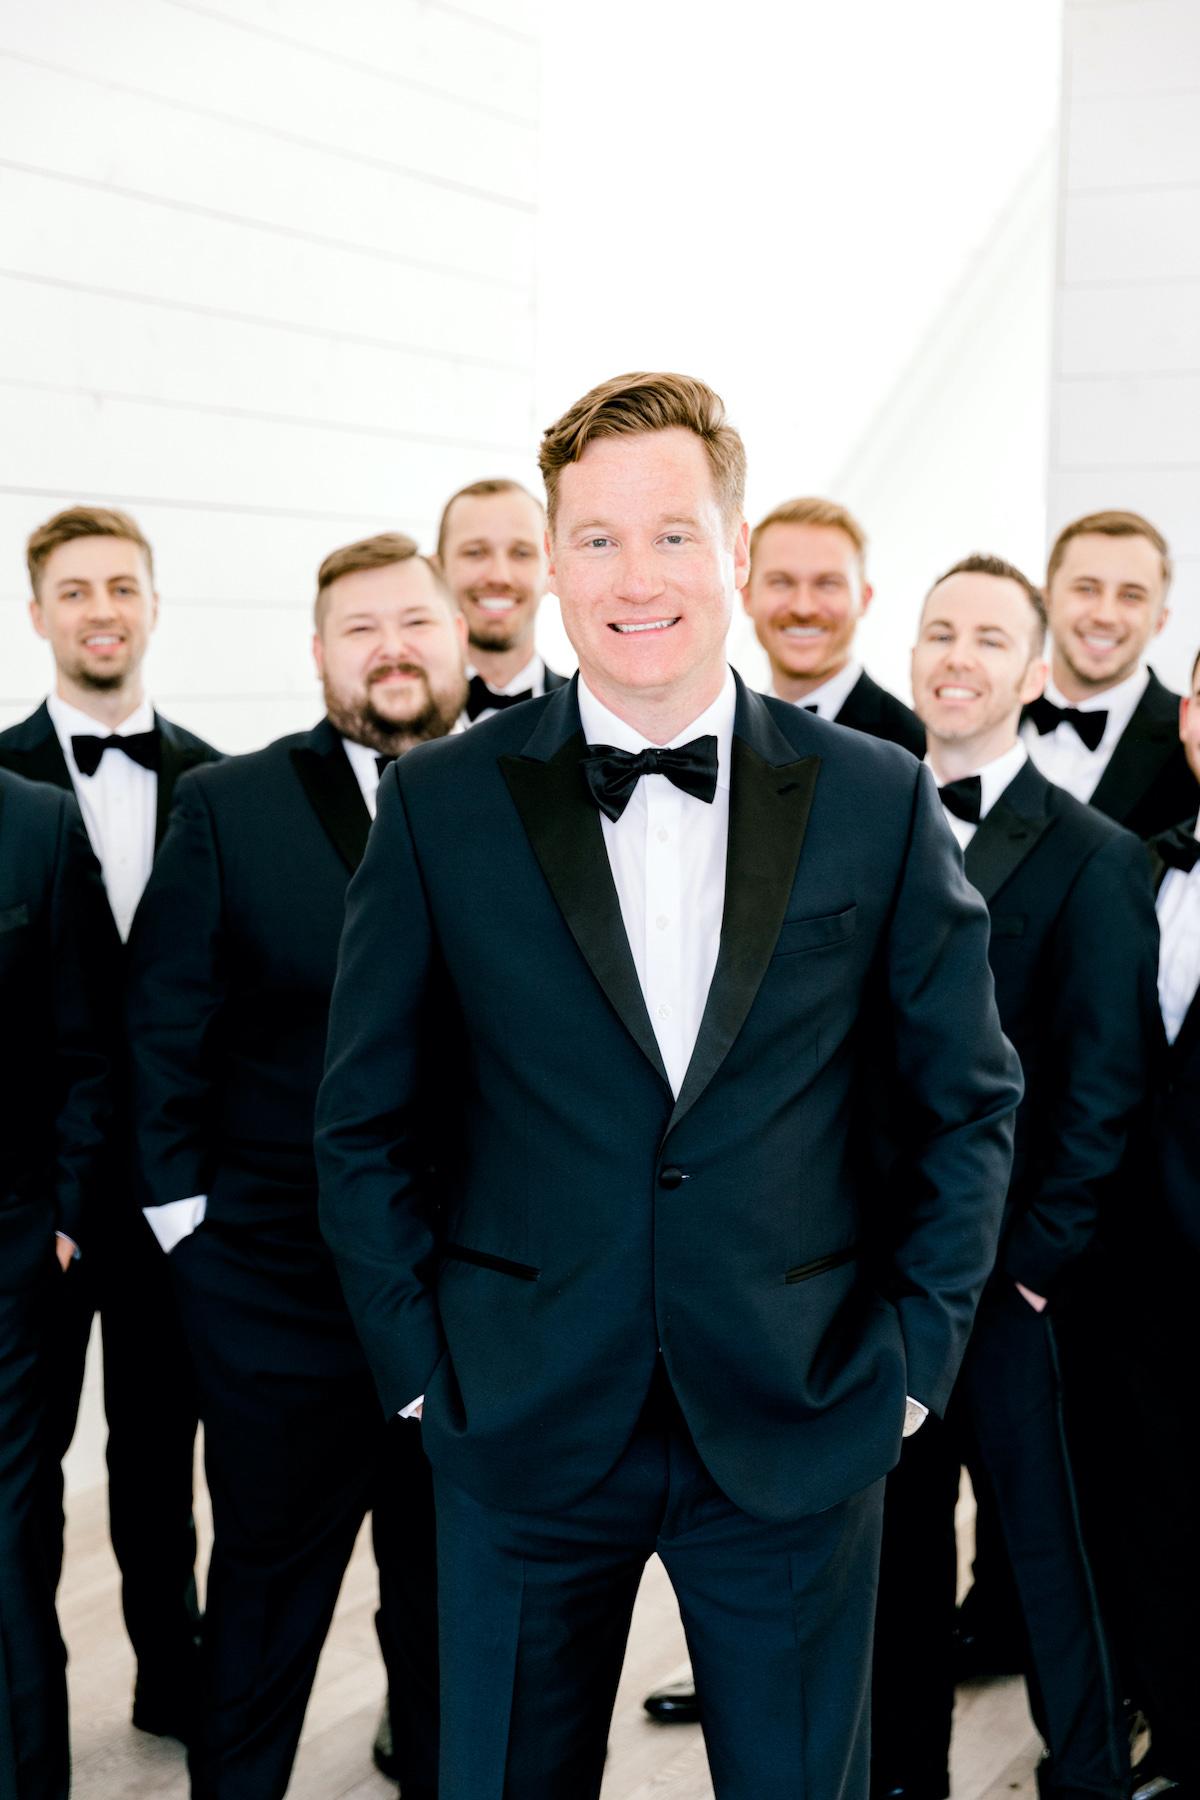 groom in navy with groomsmen standing behind him